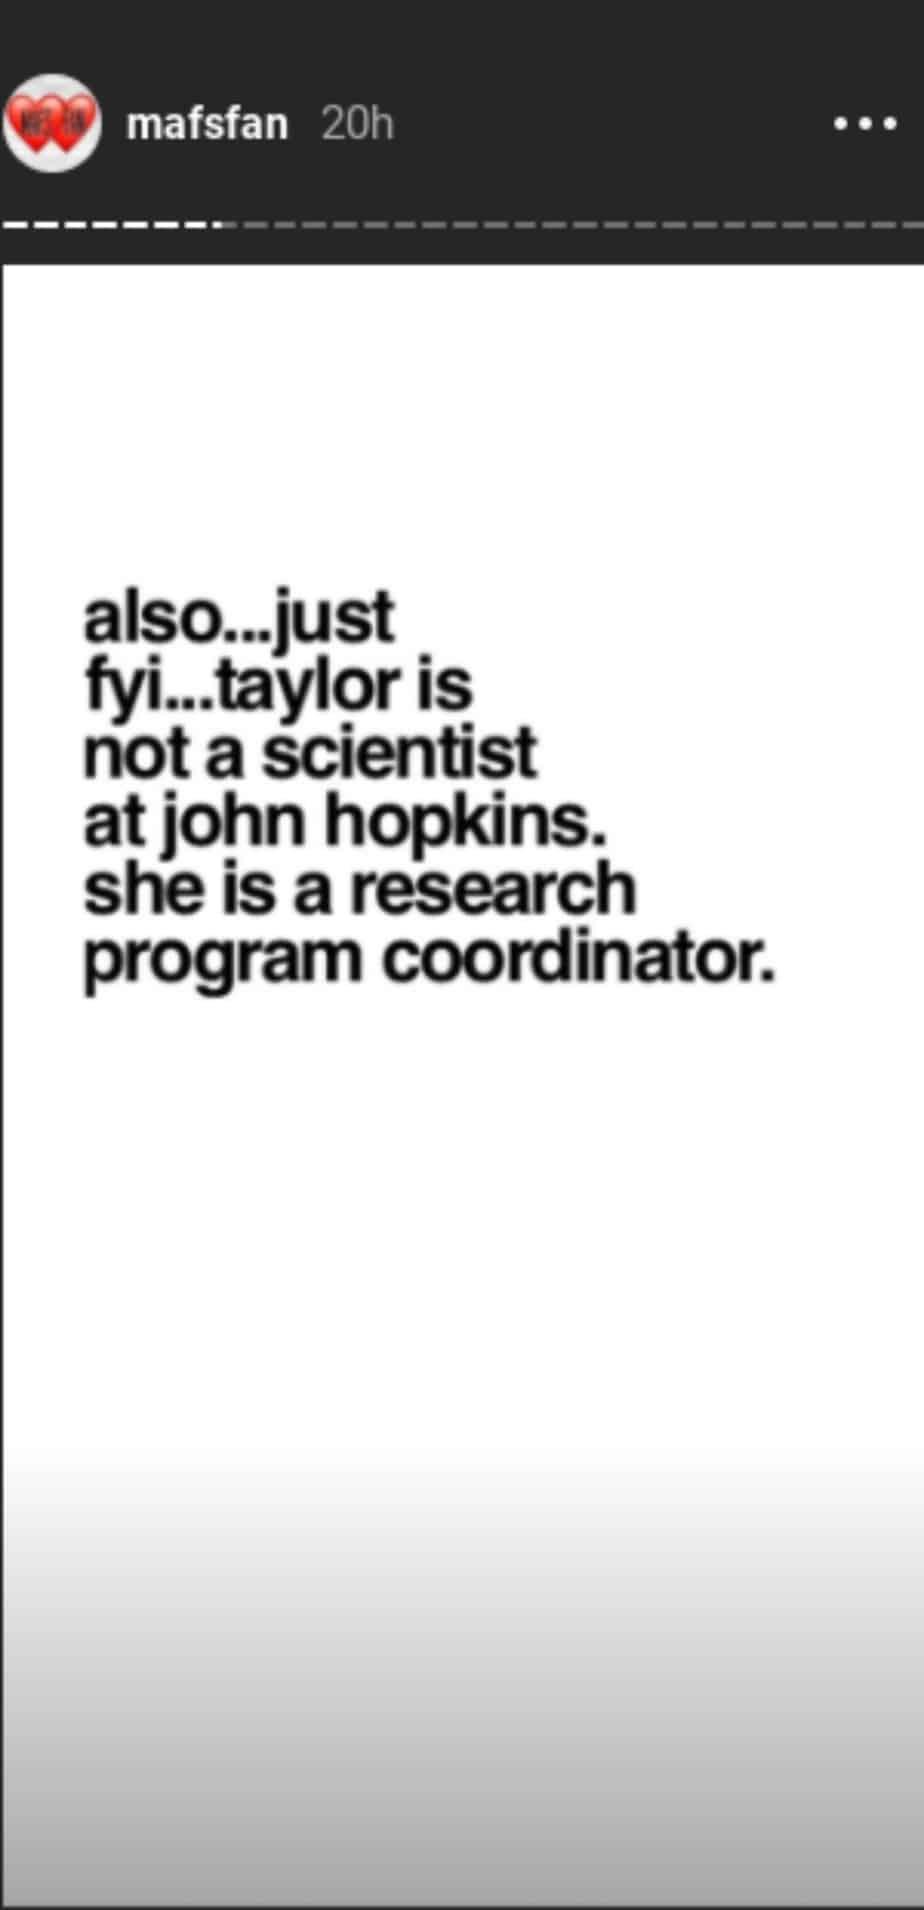 Taylor's Job description